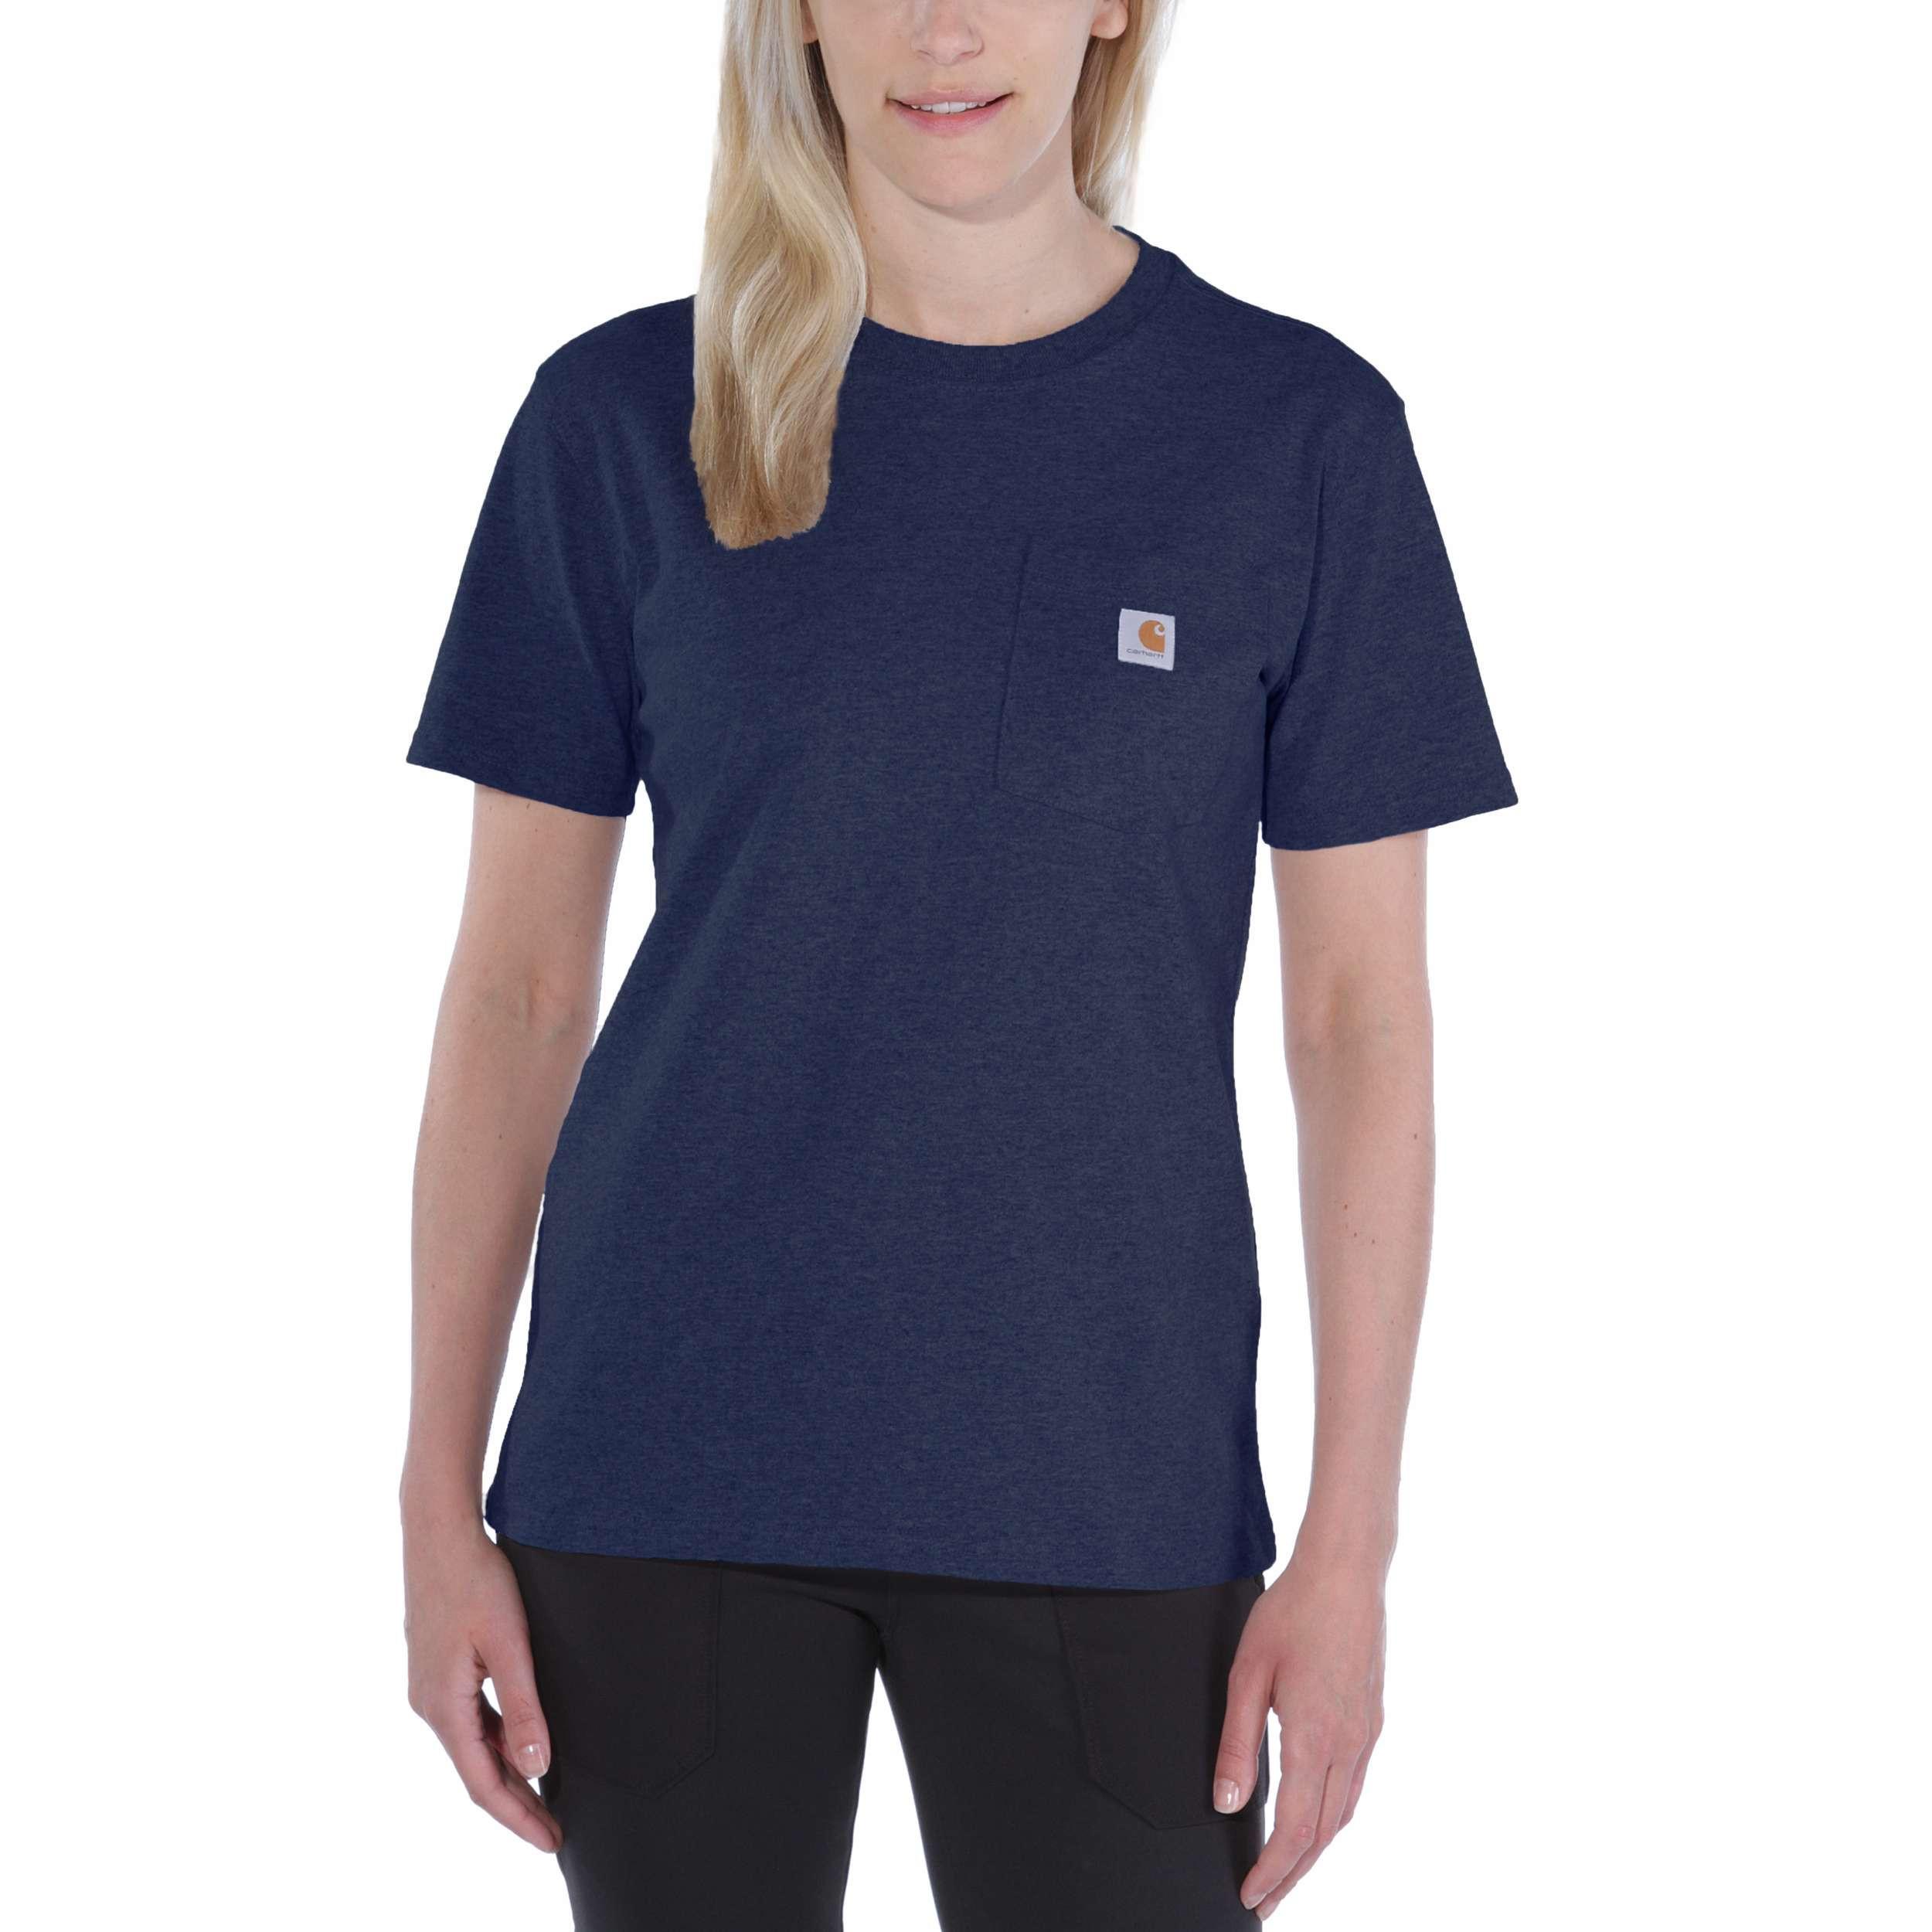 Футболка женская Carhartt WK87 Workwear Pocket T-Shirt - 103067 (Navy, XS)